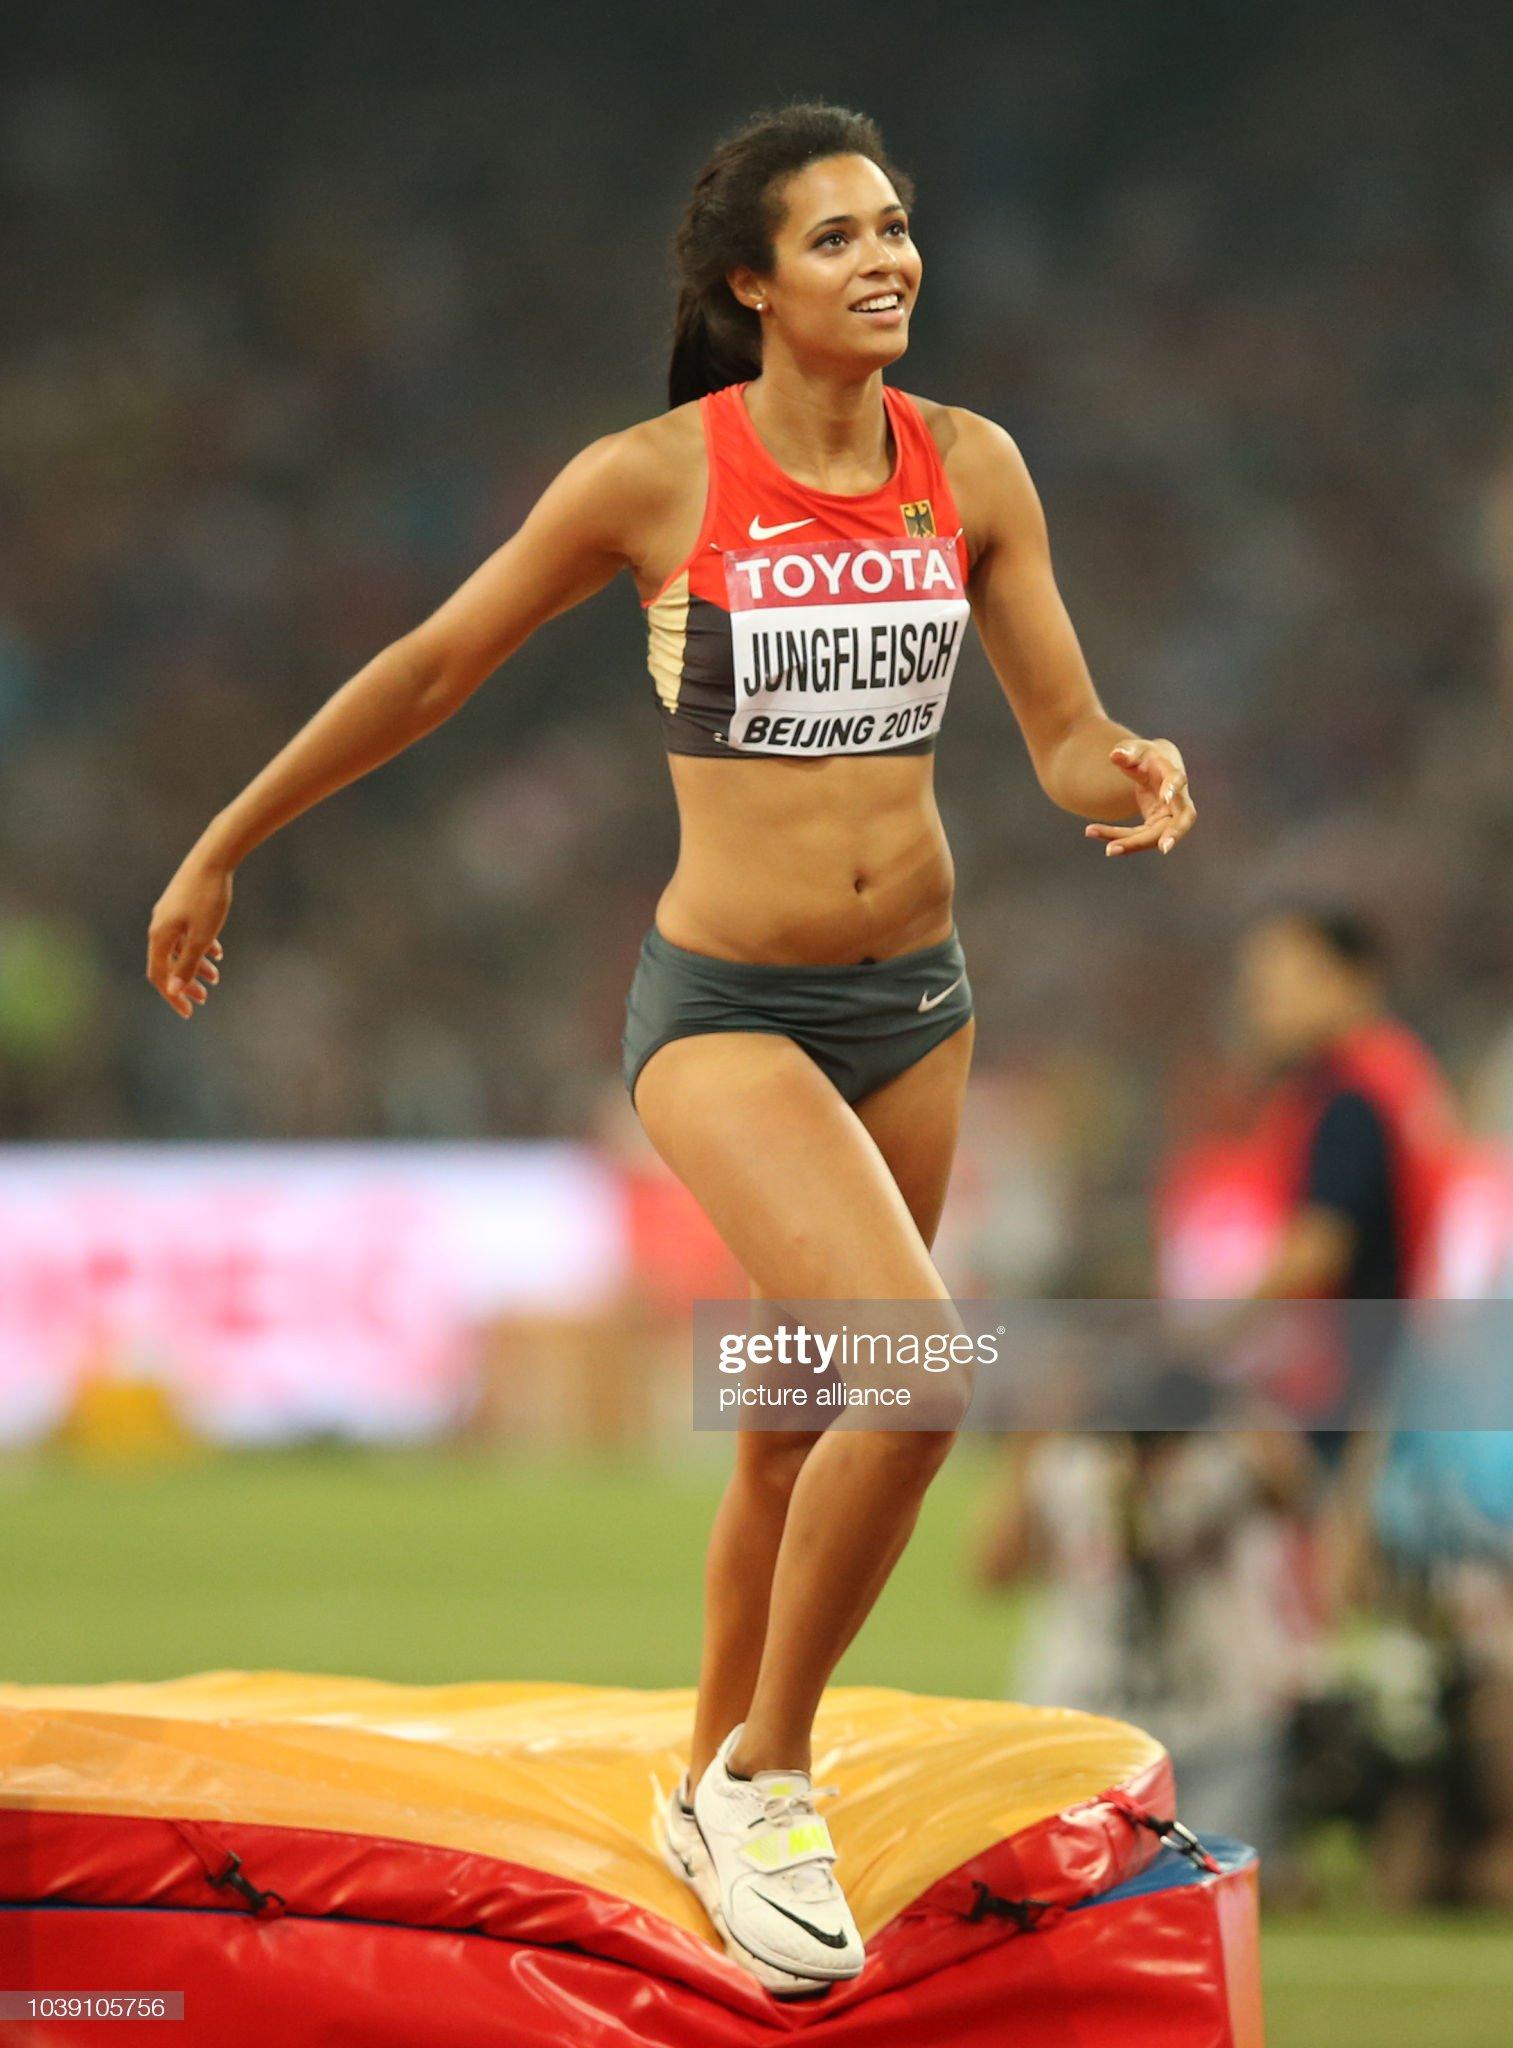 DEBATE sobre belleza, guapura y hermosura (fotos) - VOL II - Página 17 Marielaurence-jungfleisch-of-germany-competes-during-womens-high-jump-picture-id1039105756?s=2048x2048